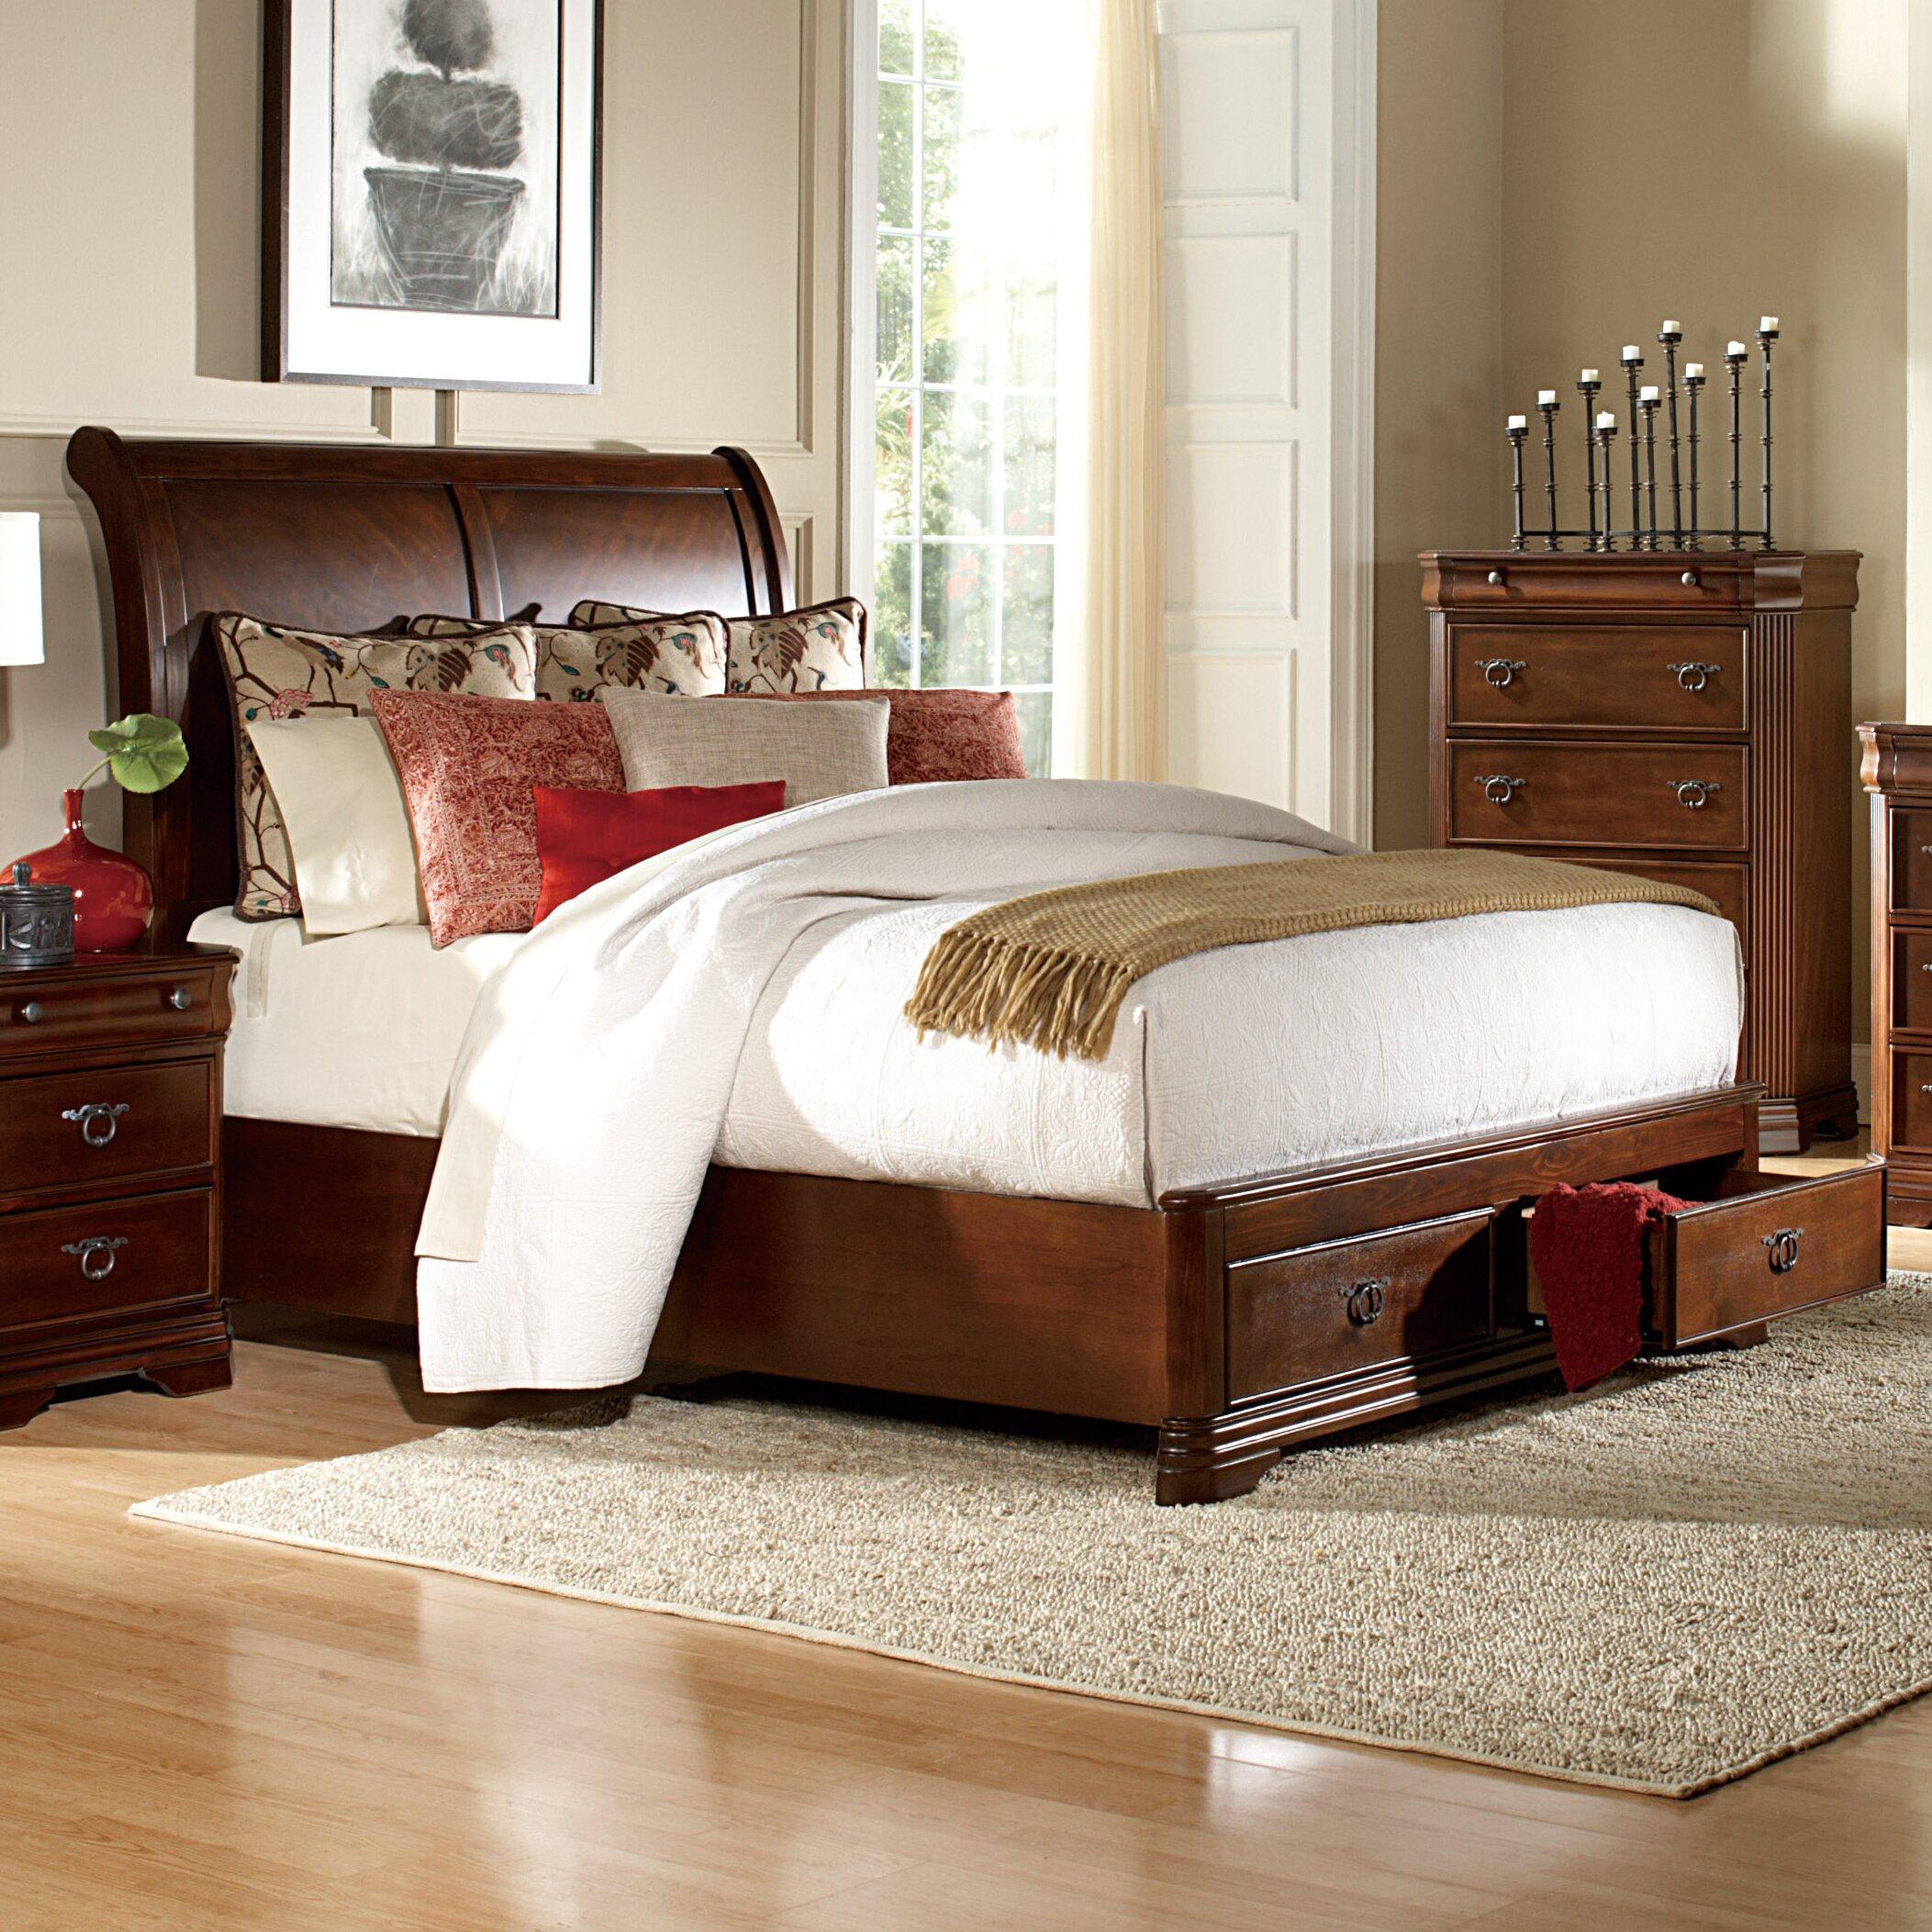 woodhaven hill karla queen platform customizable bedroom set reviews. Black Bedroom Furniture Sets. Home Design Ideas